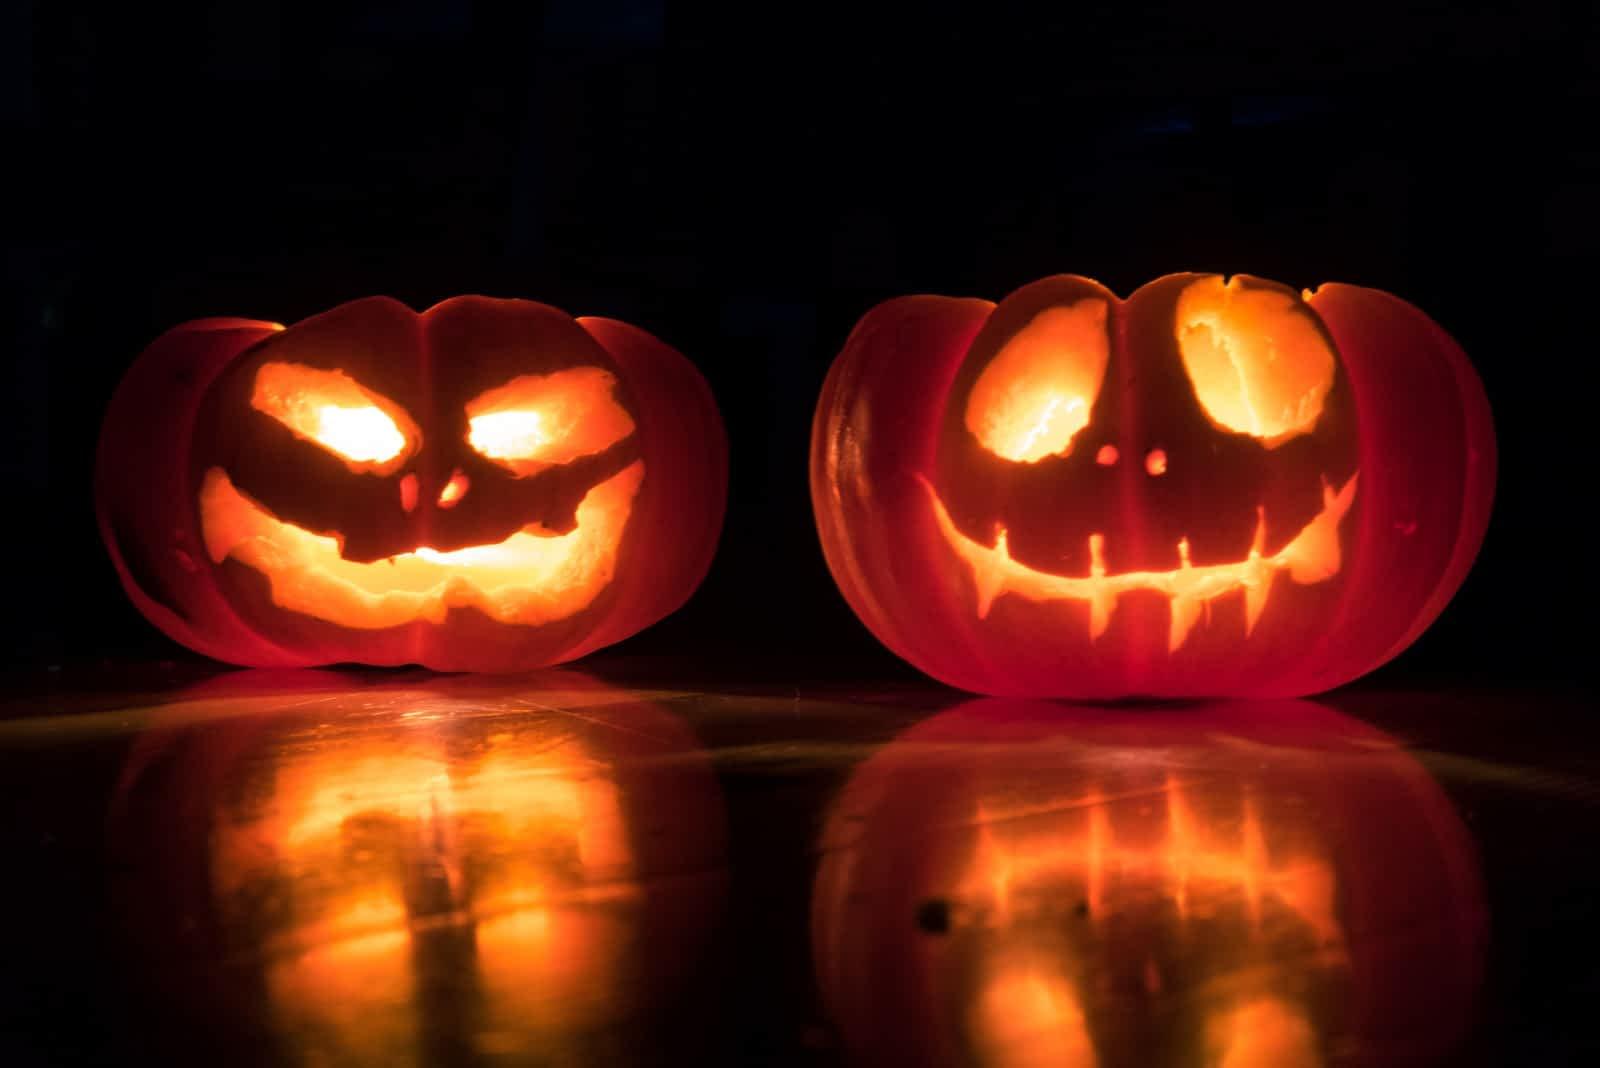 Chocolate treats, but no tricks, for Halloween